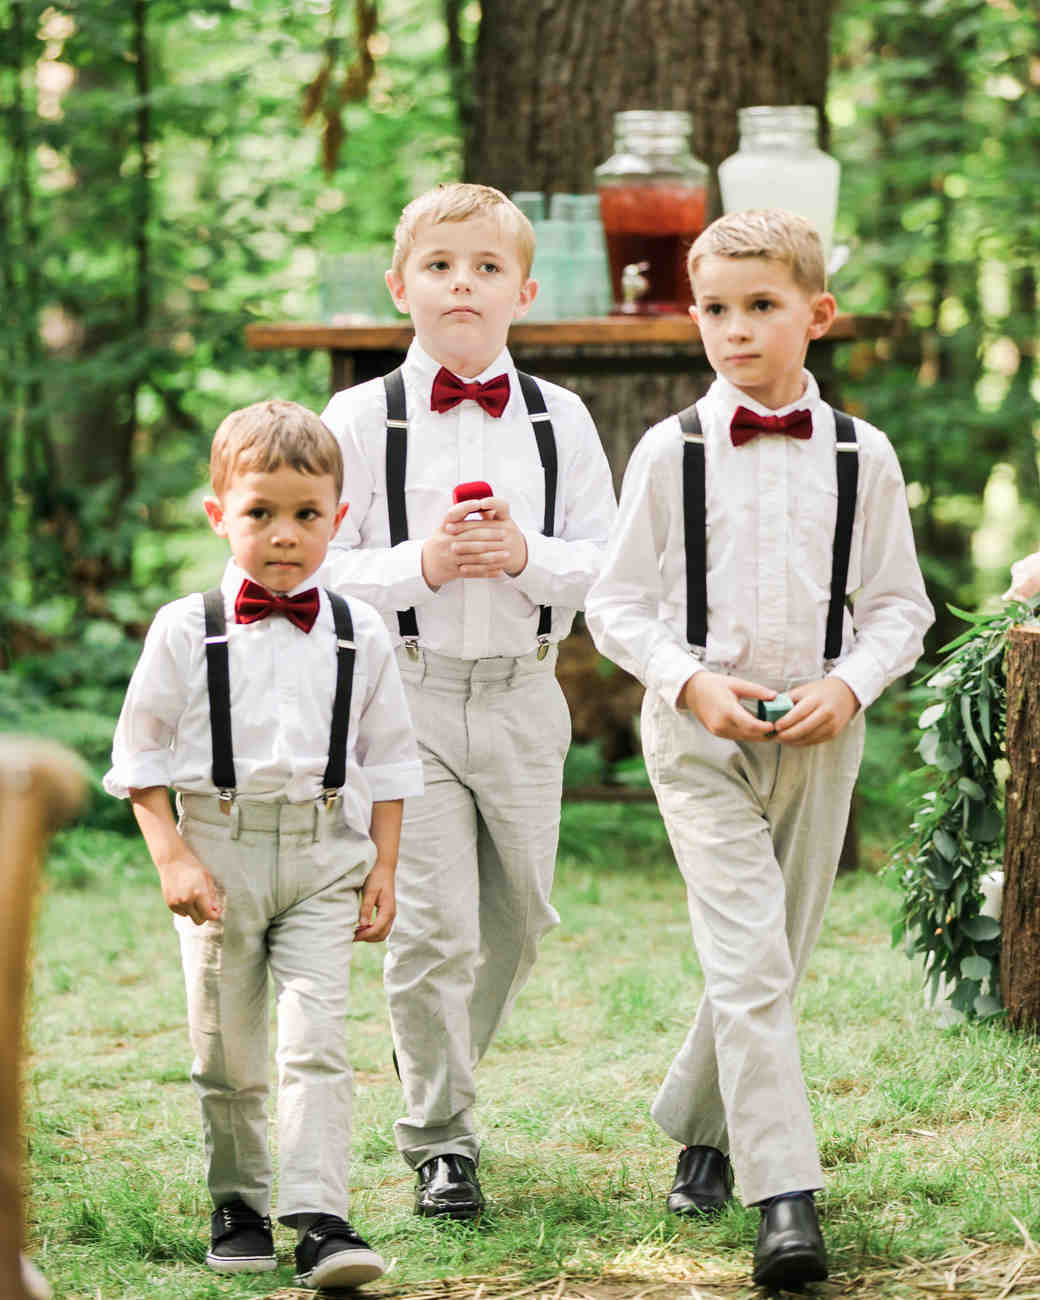 vanessa steven wedding ring bearers